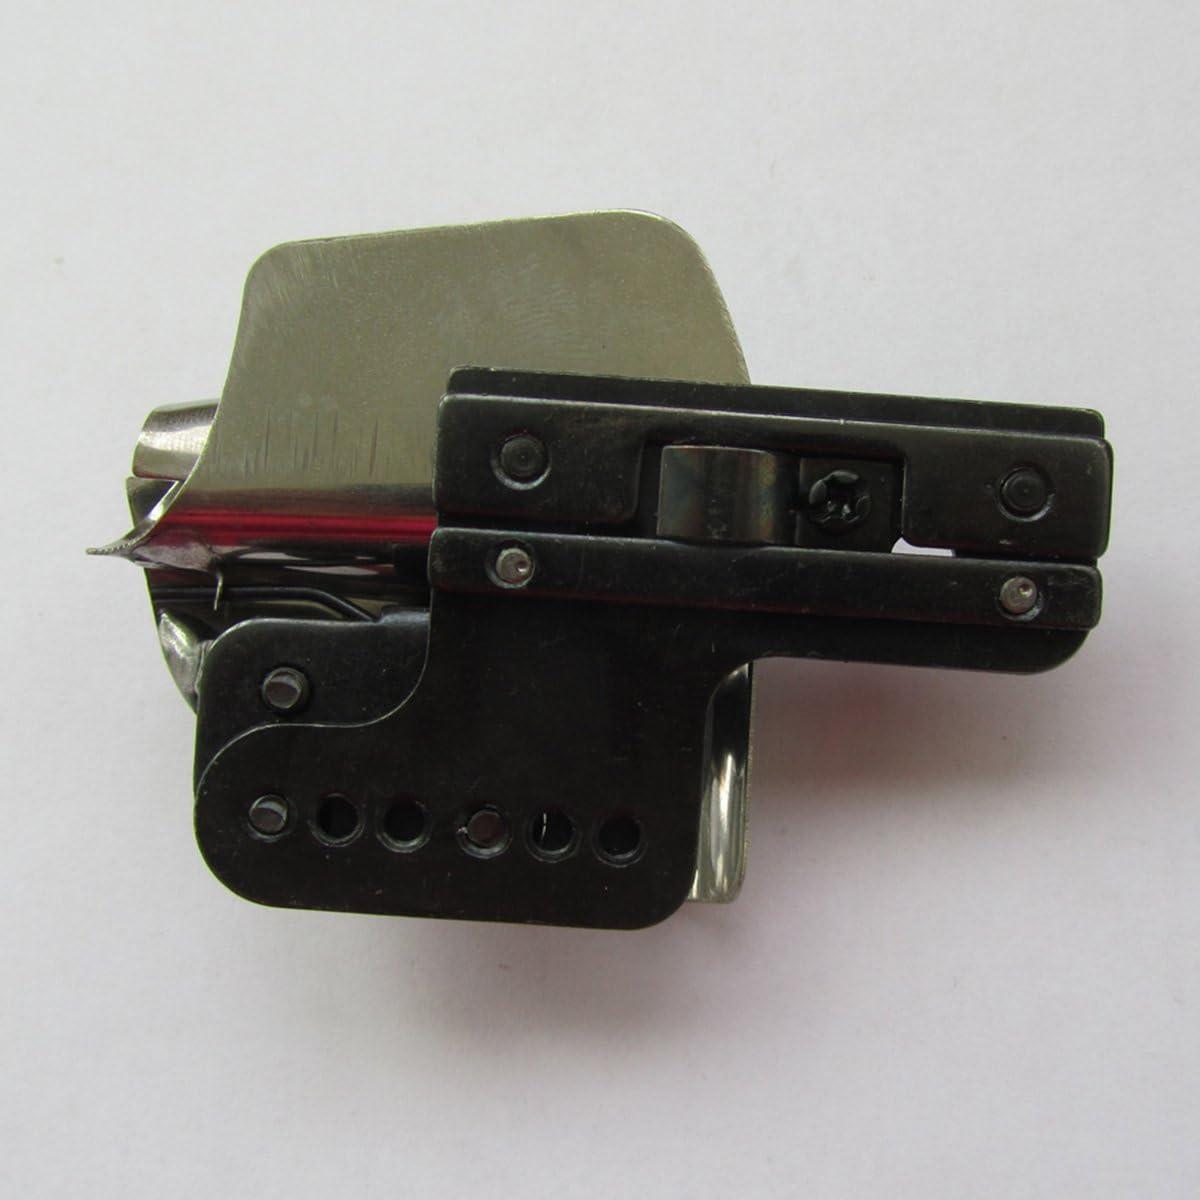 23420Z-1//4XH Union Special 35800 1//4XH Lap Seam Folder